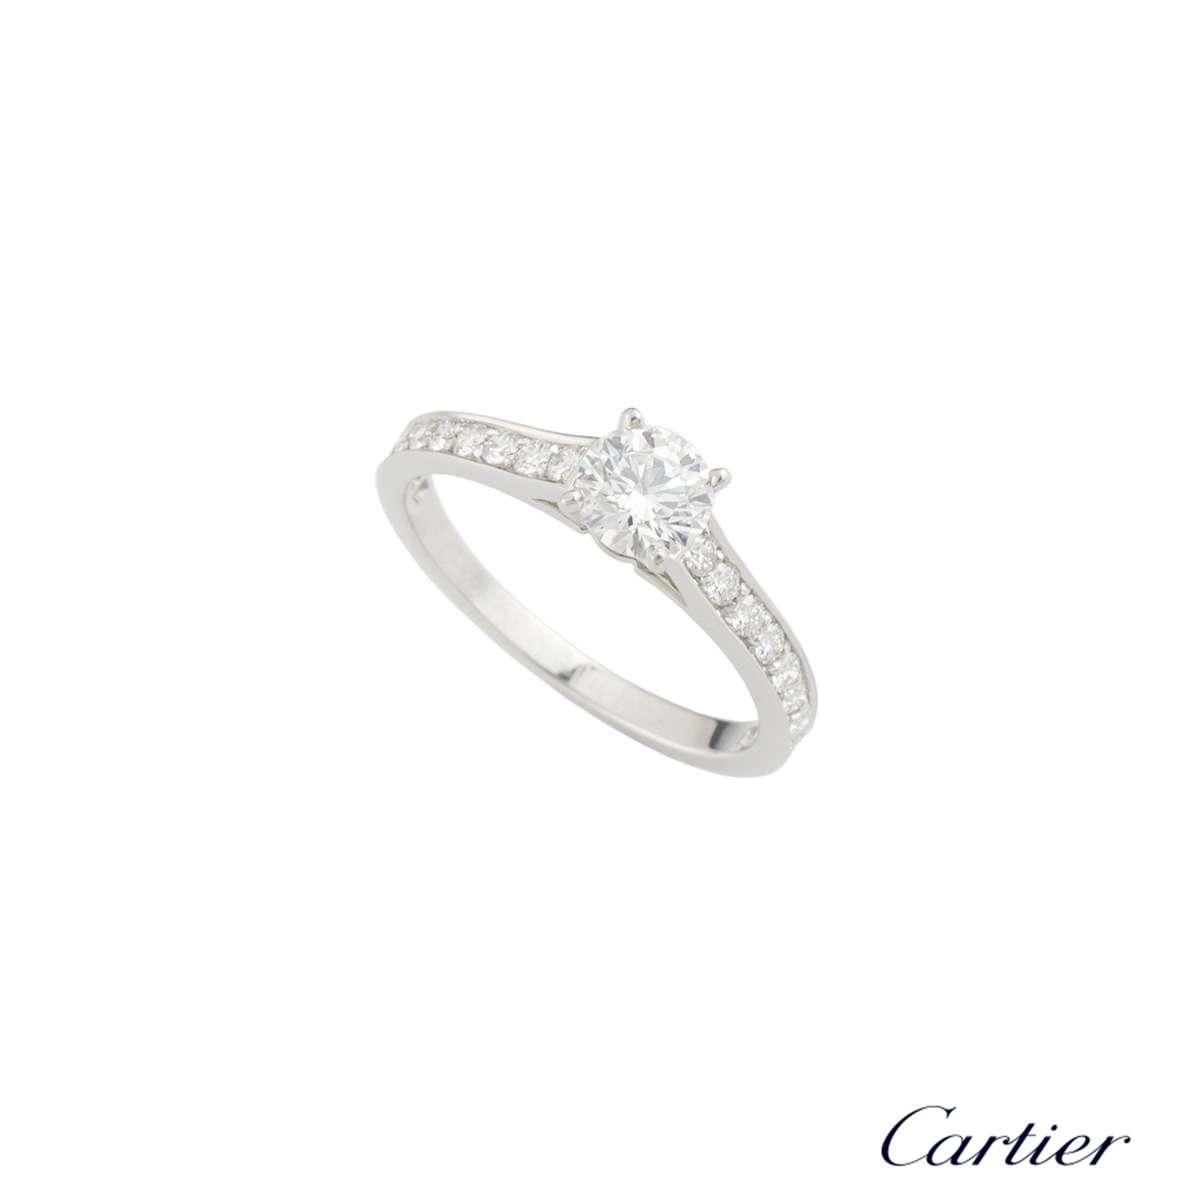 Cartier Platinum Diamond 1895 Solitaire Ring 0.44ct E/VS1 Size 49 N4164649